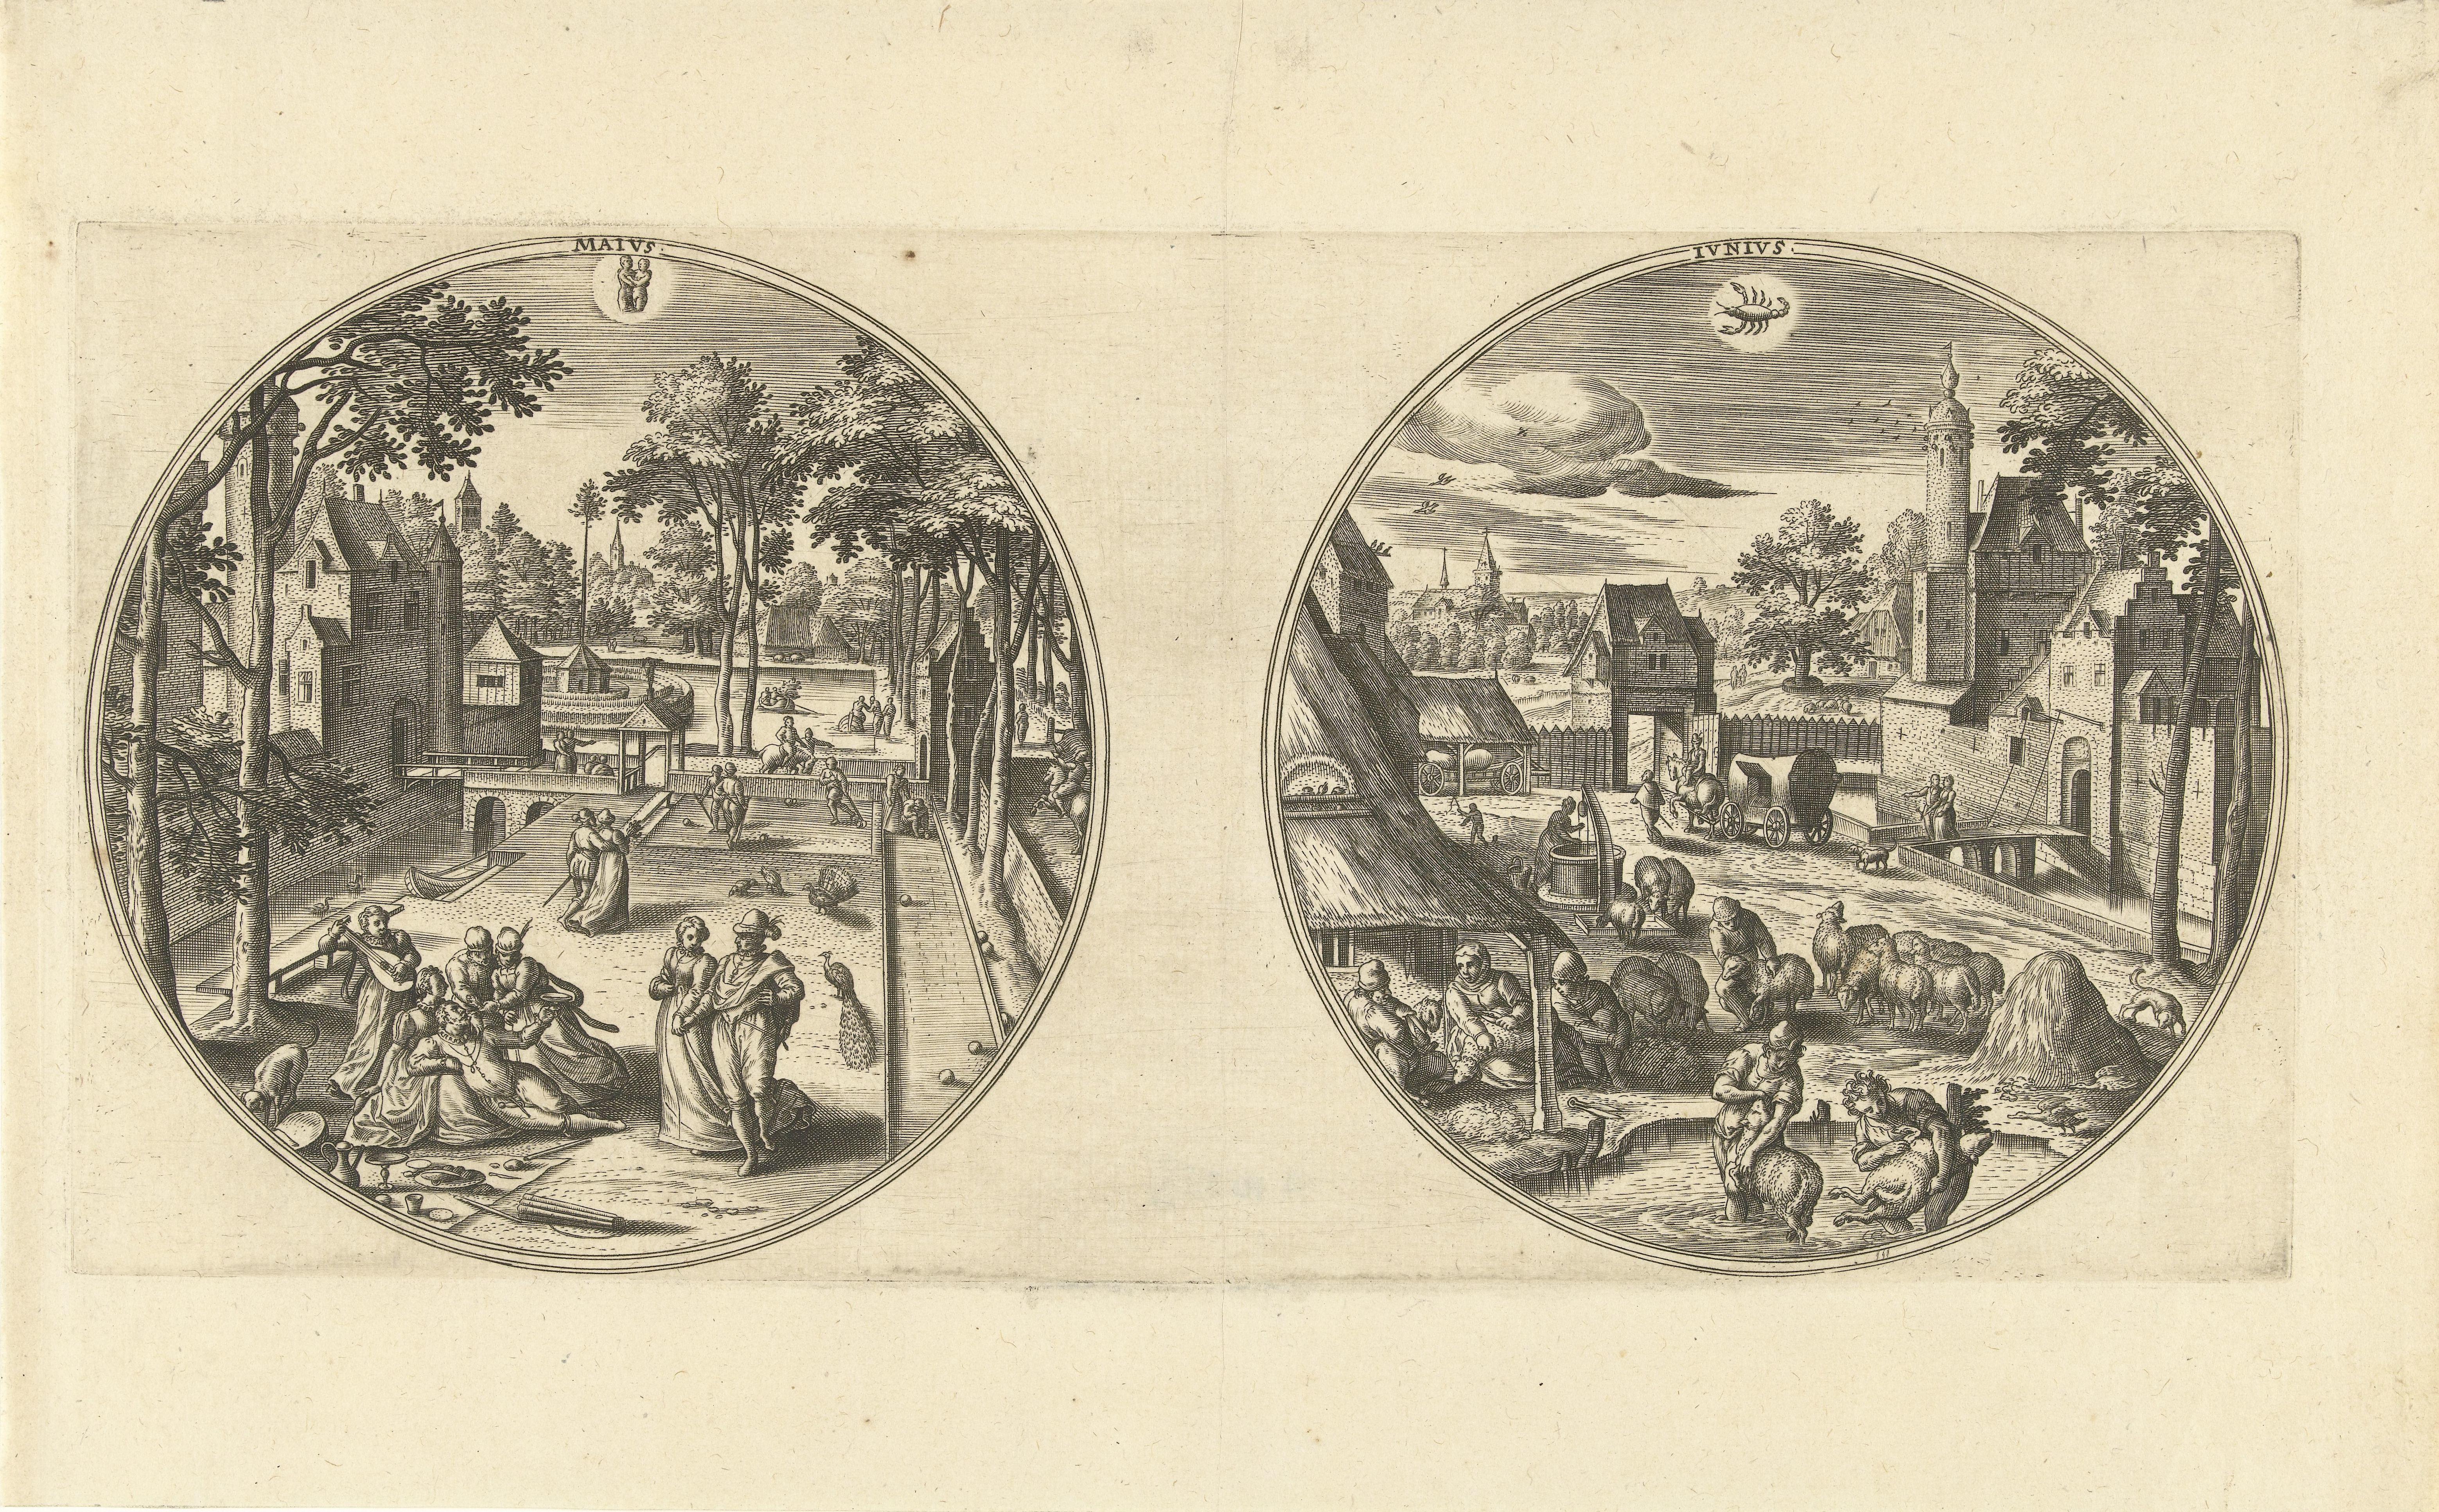 Adriaen Collaert, Klossen. 1578-1582